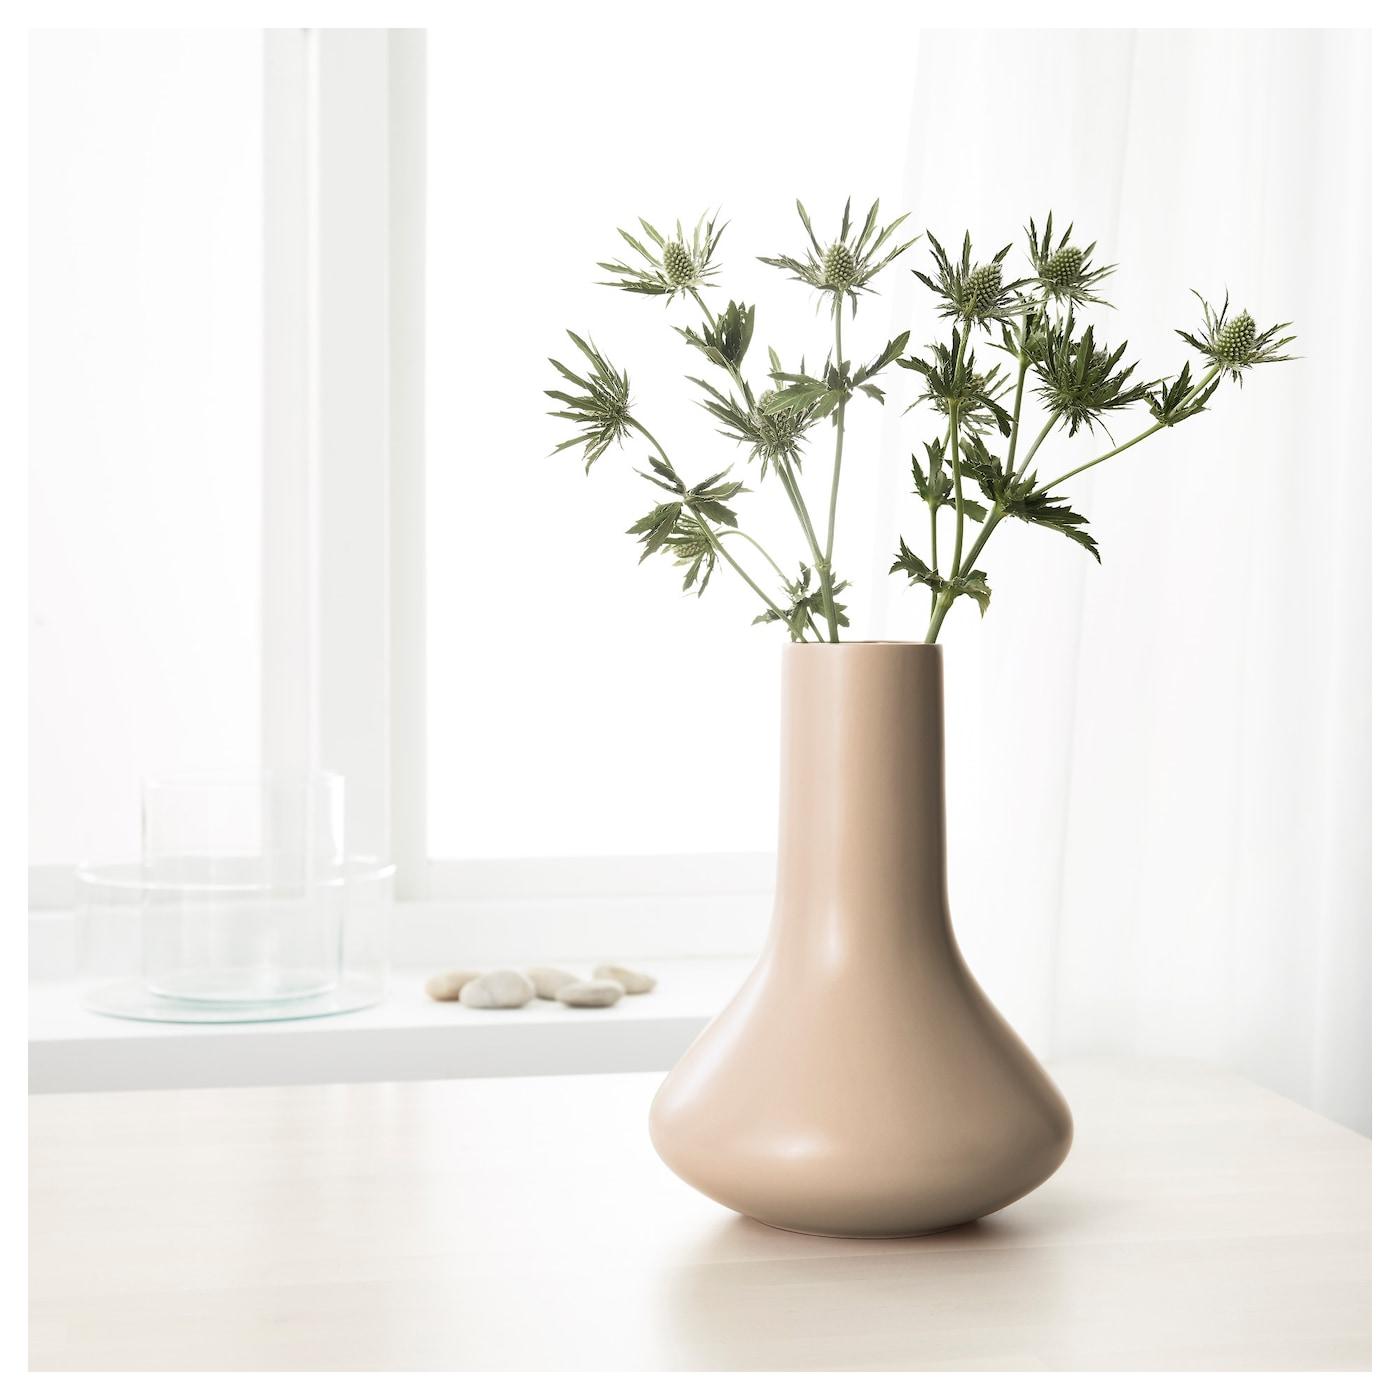 Design Ikea Vases gradvis vase beige 28 cm ikea vase